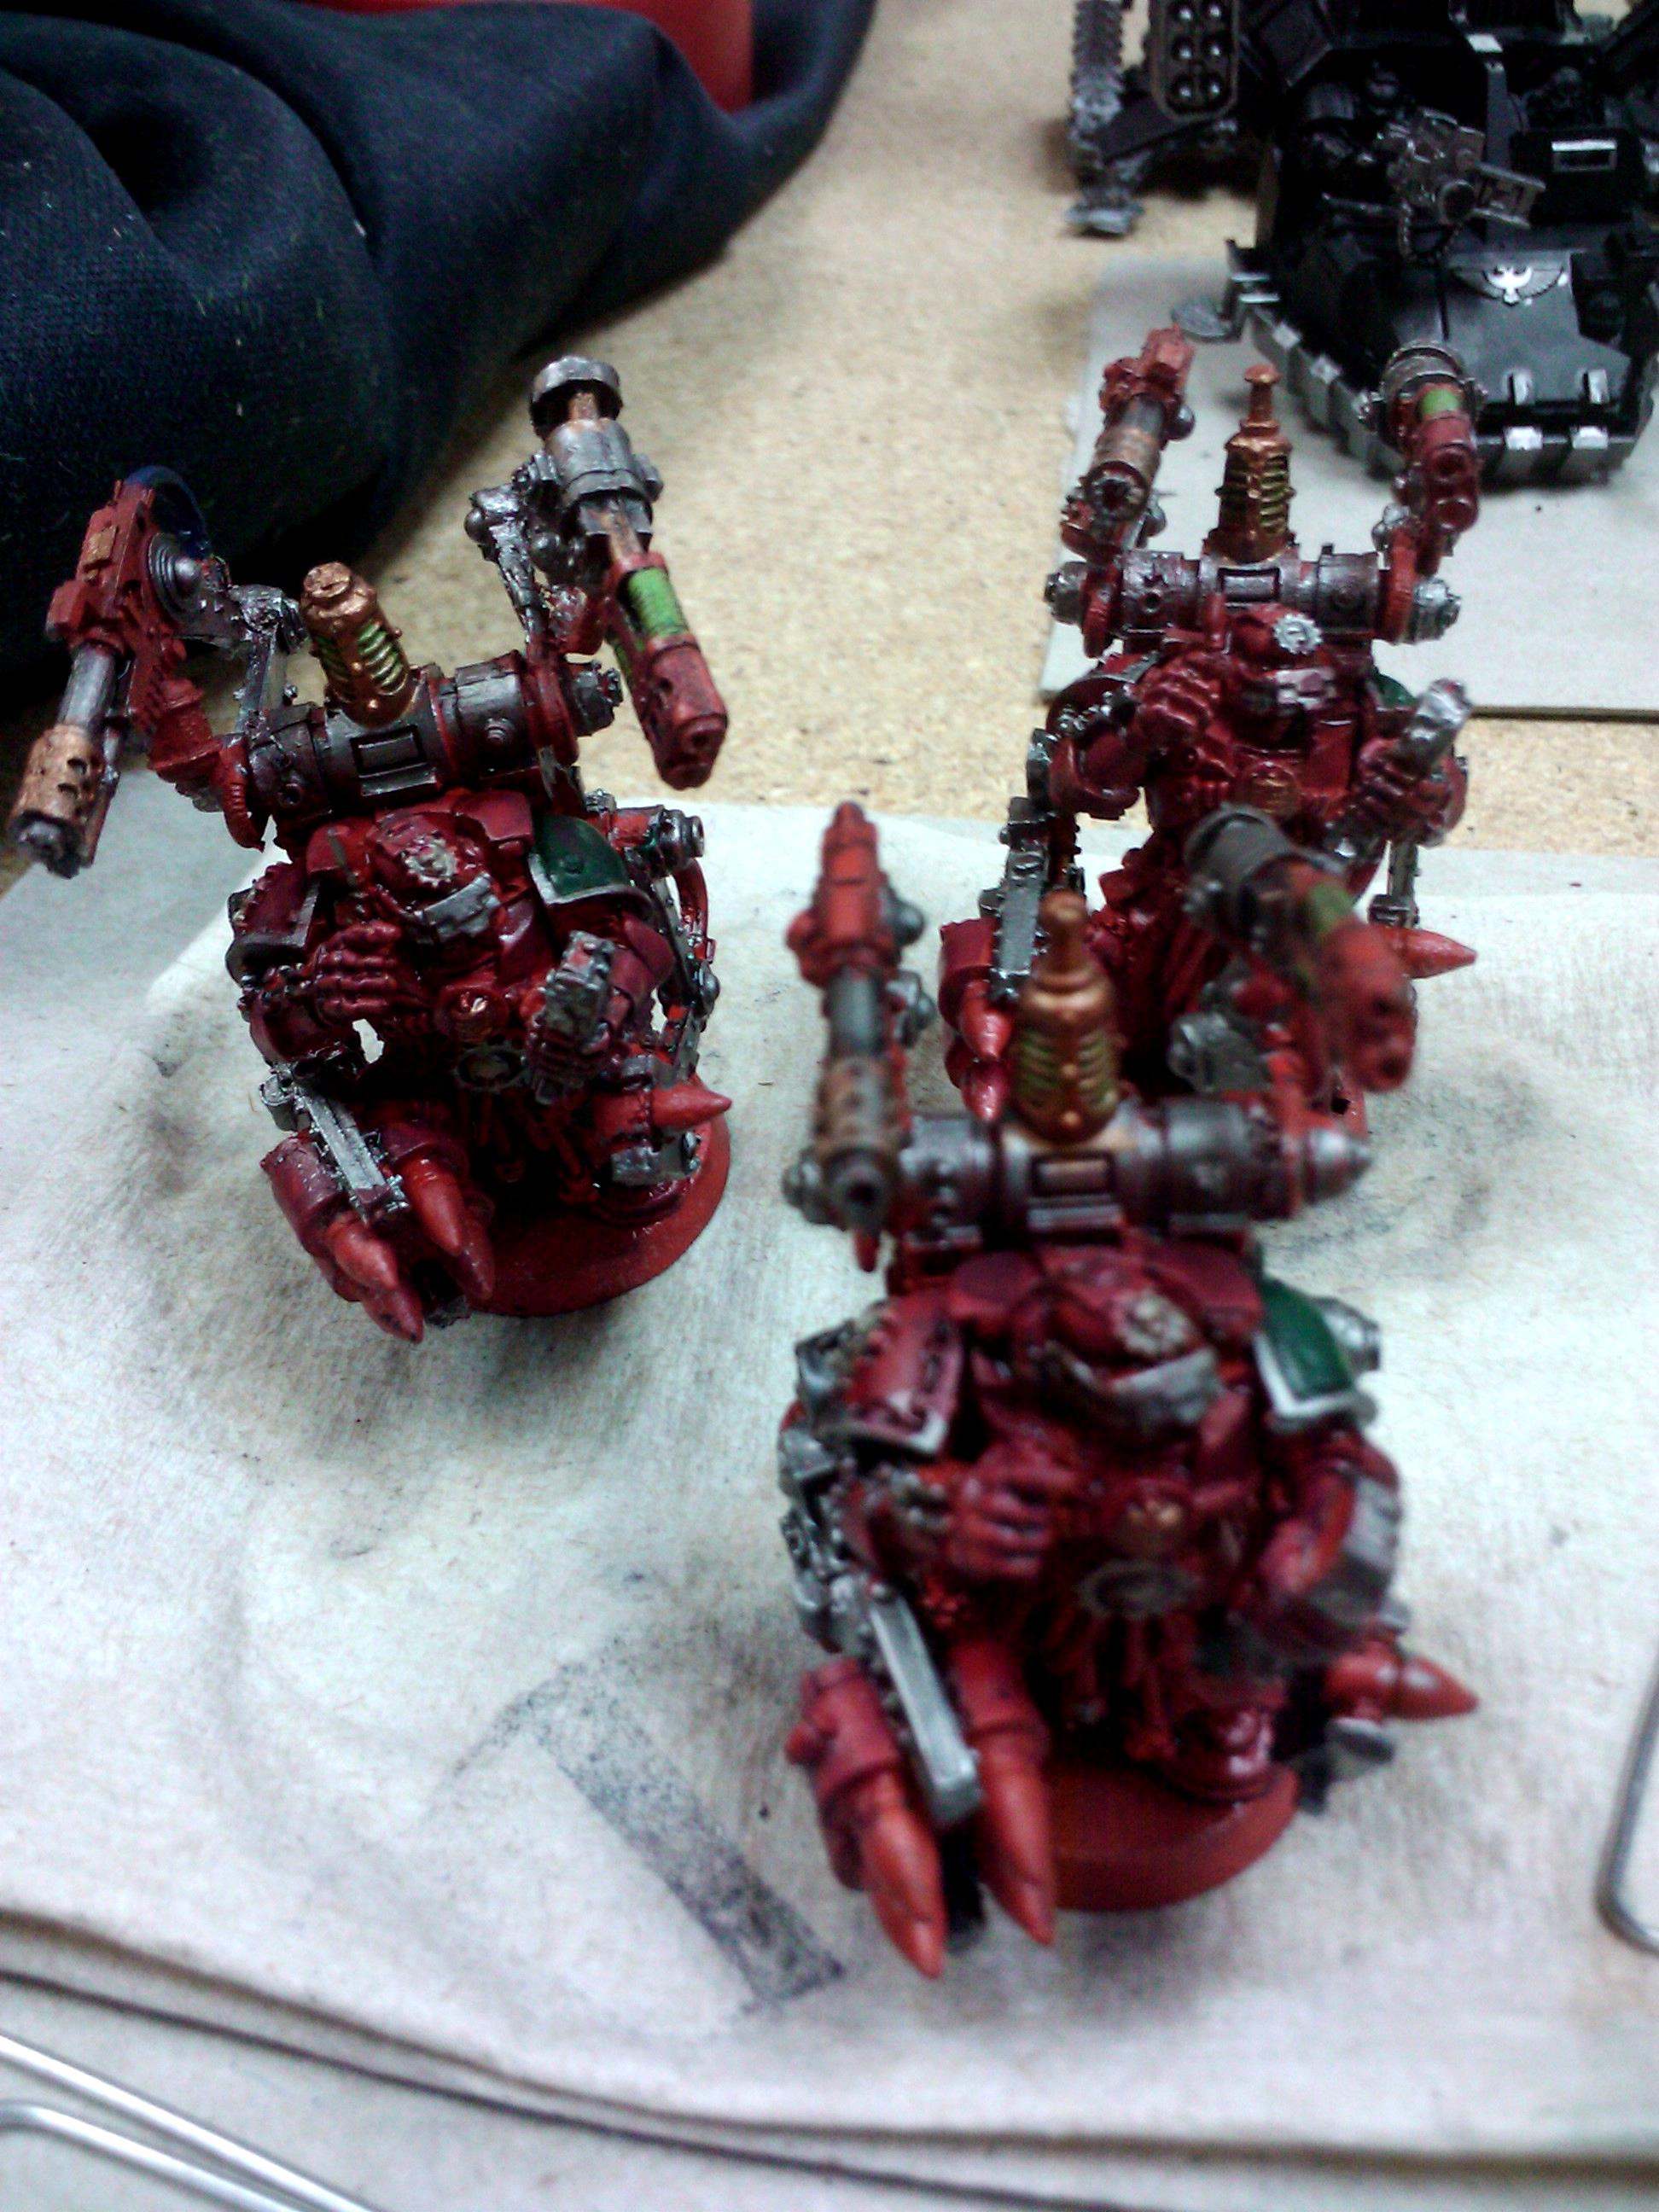 Commission, Dark Angels, Games Workshop, Painting, Scouts, Space Marines, Techmarine, Thunderfire, Warhammer 40,000